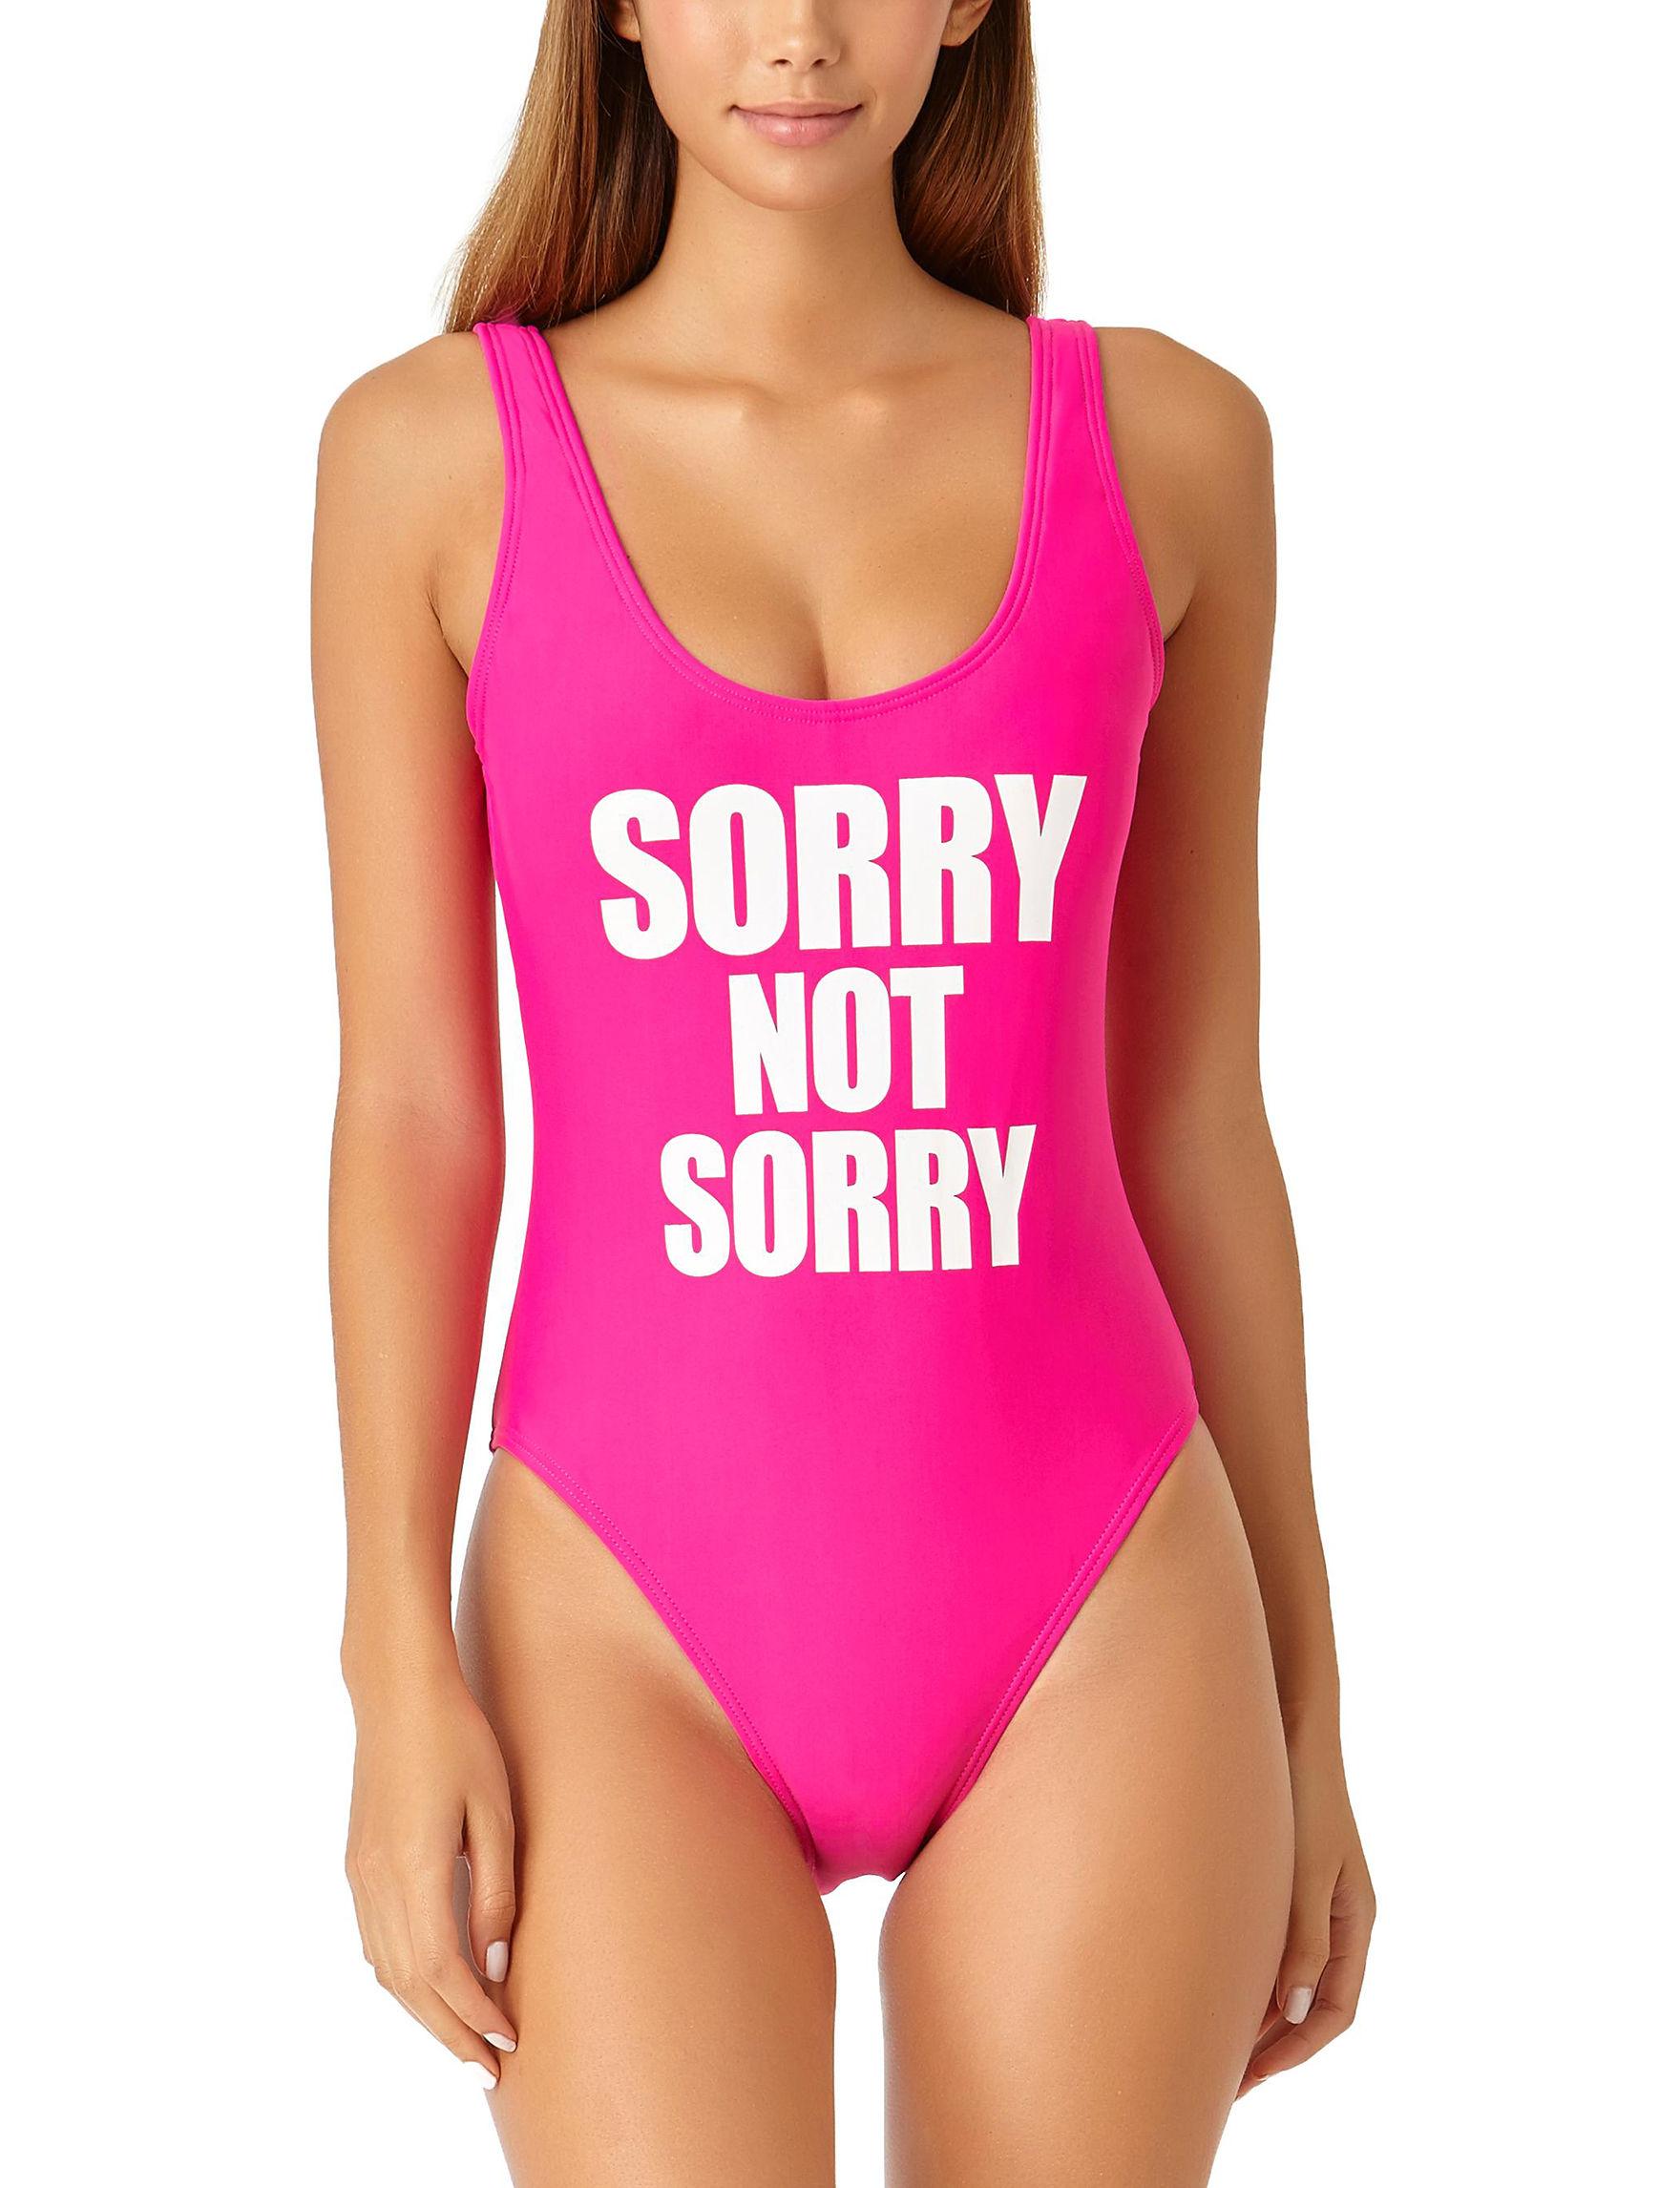 California Sunshine Pink One-piece Swimsuits